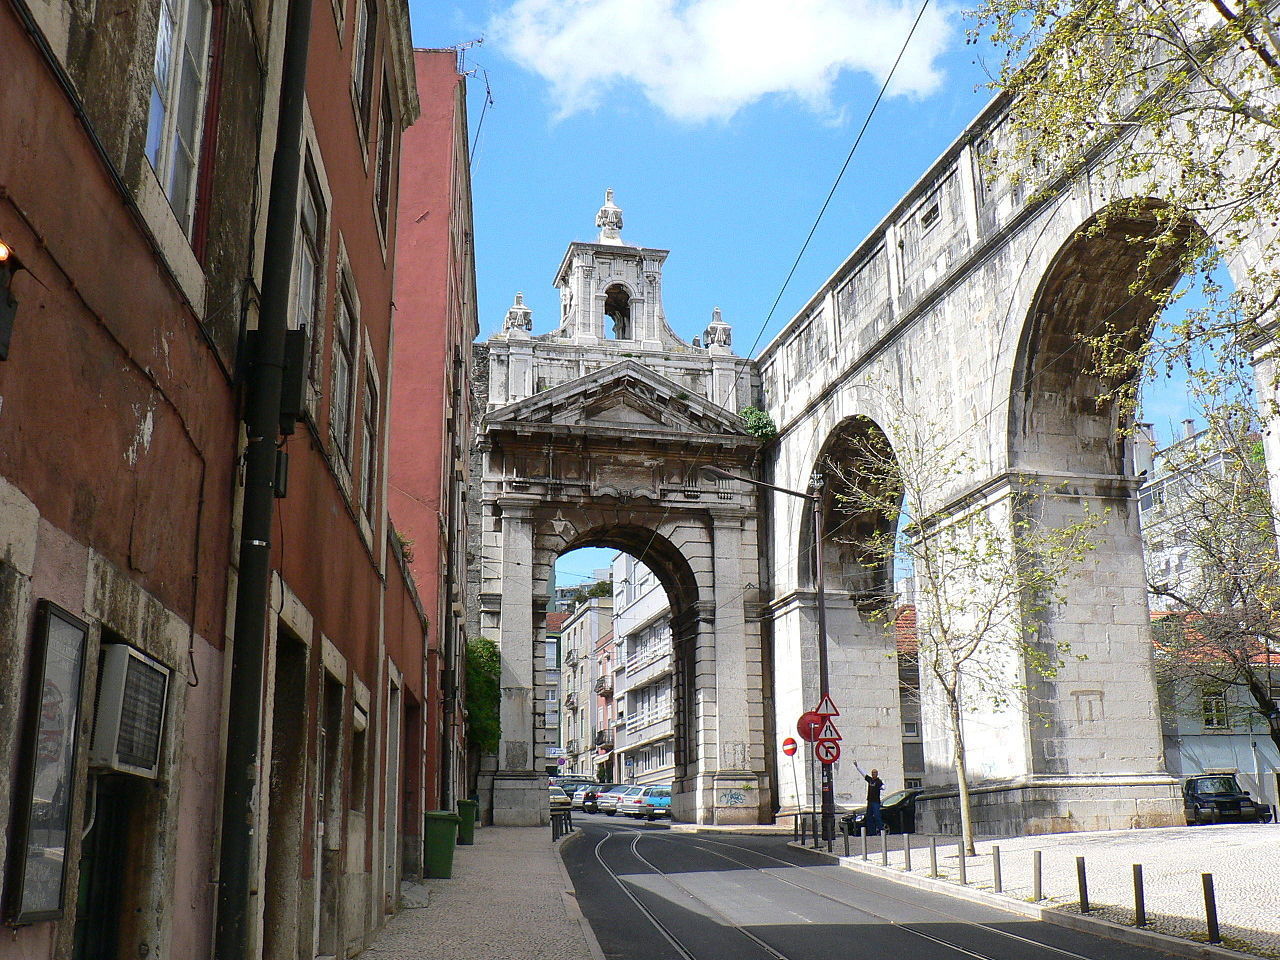 Акведук Агуаш-Либриш, арка в центре города